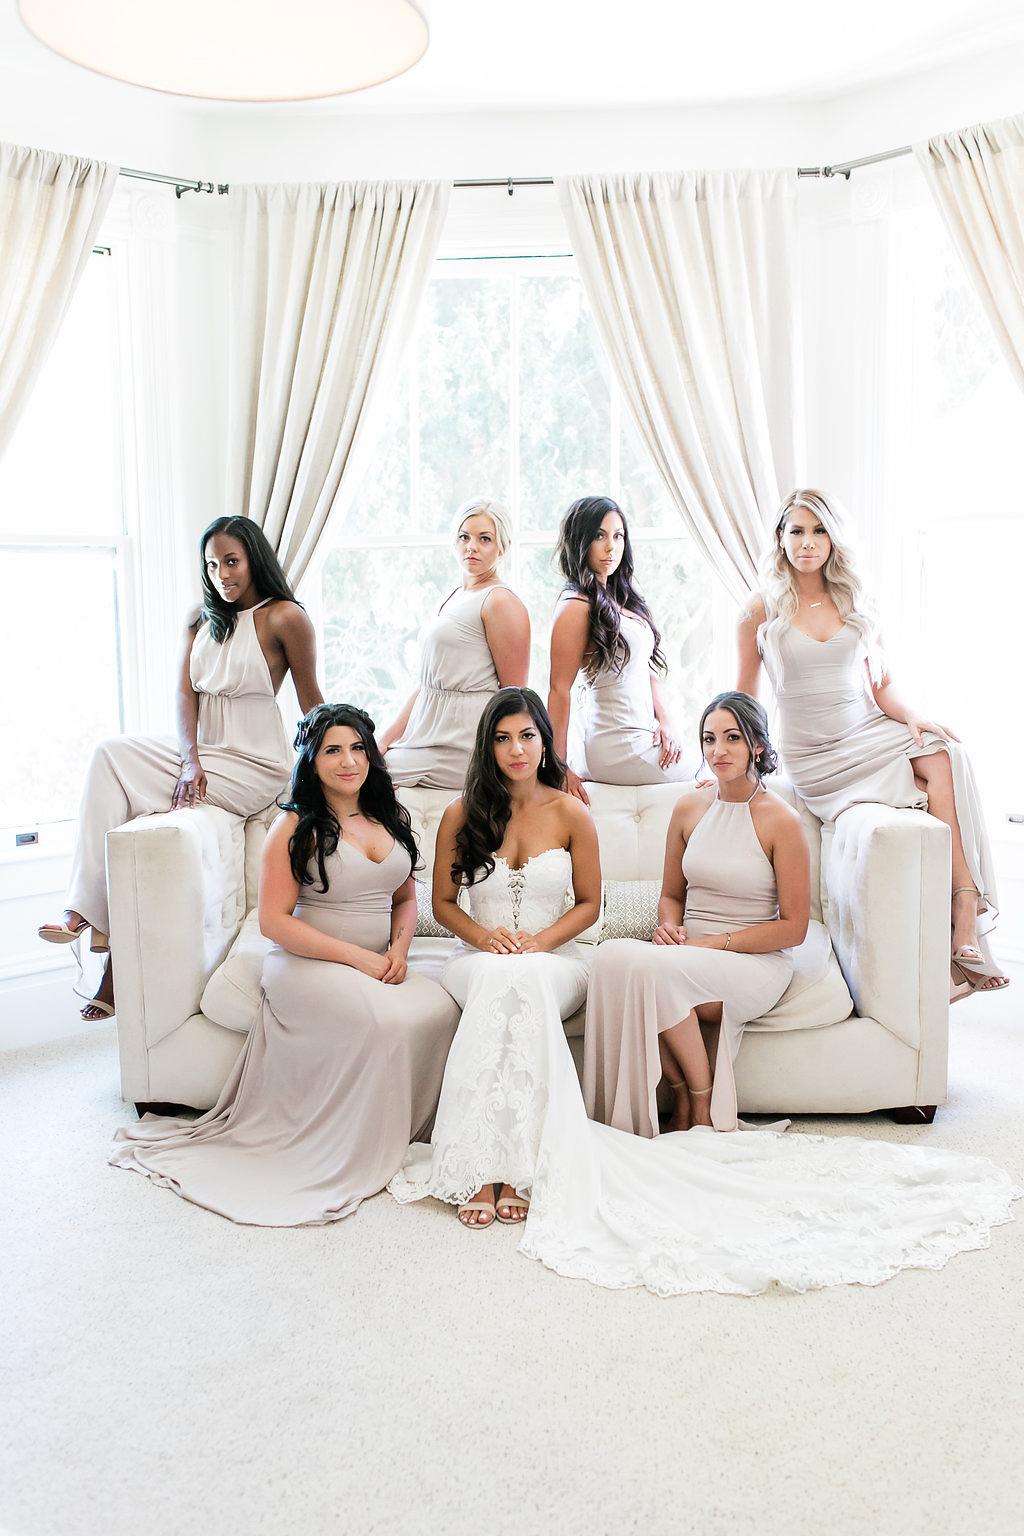 Park Winters Wedding | Bridesmaids Photo | Wedding Party Photo | Nude Bridesmaids Dress